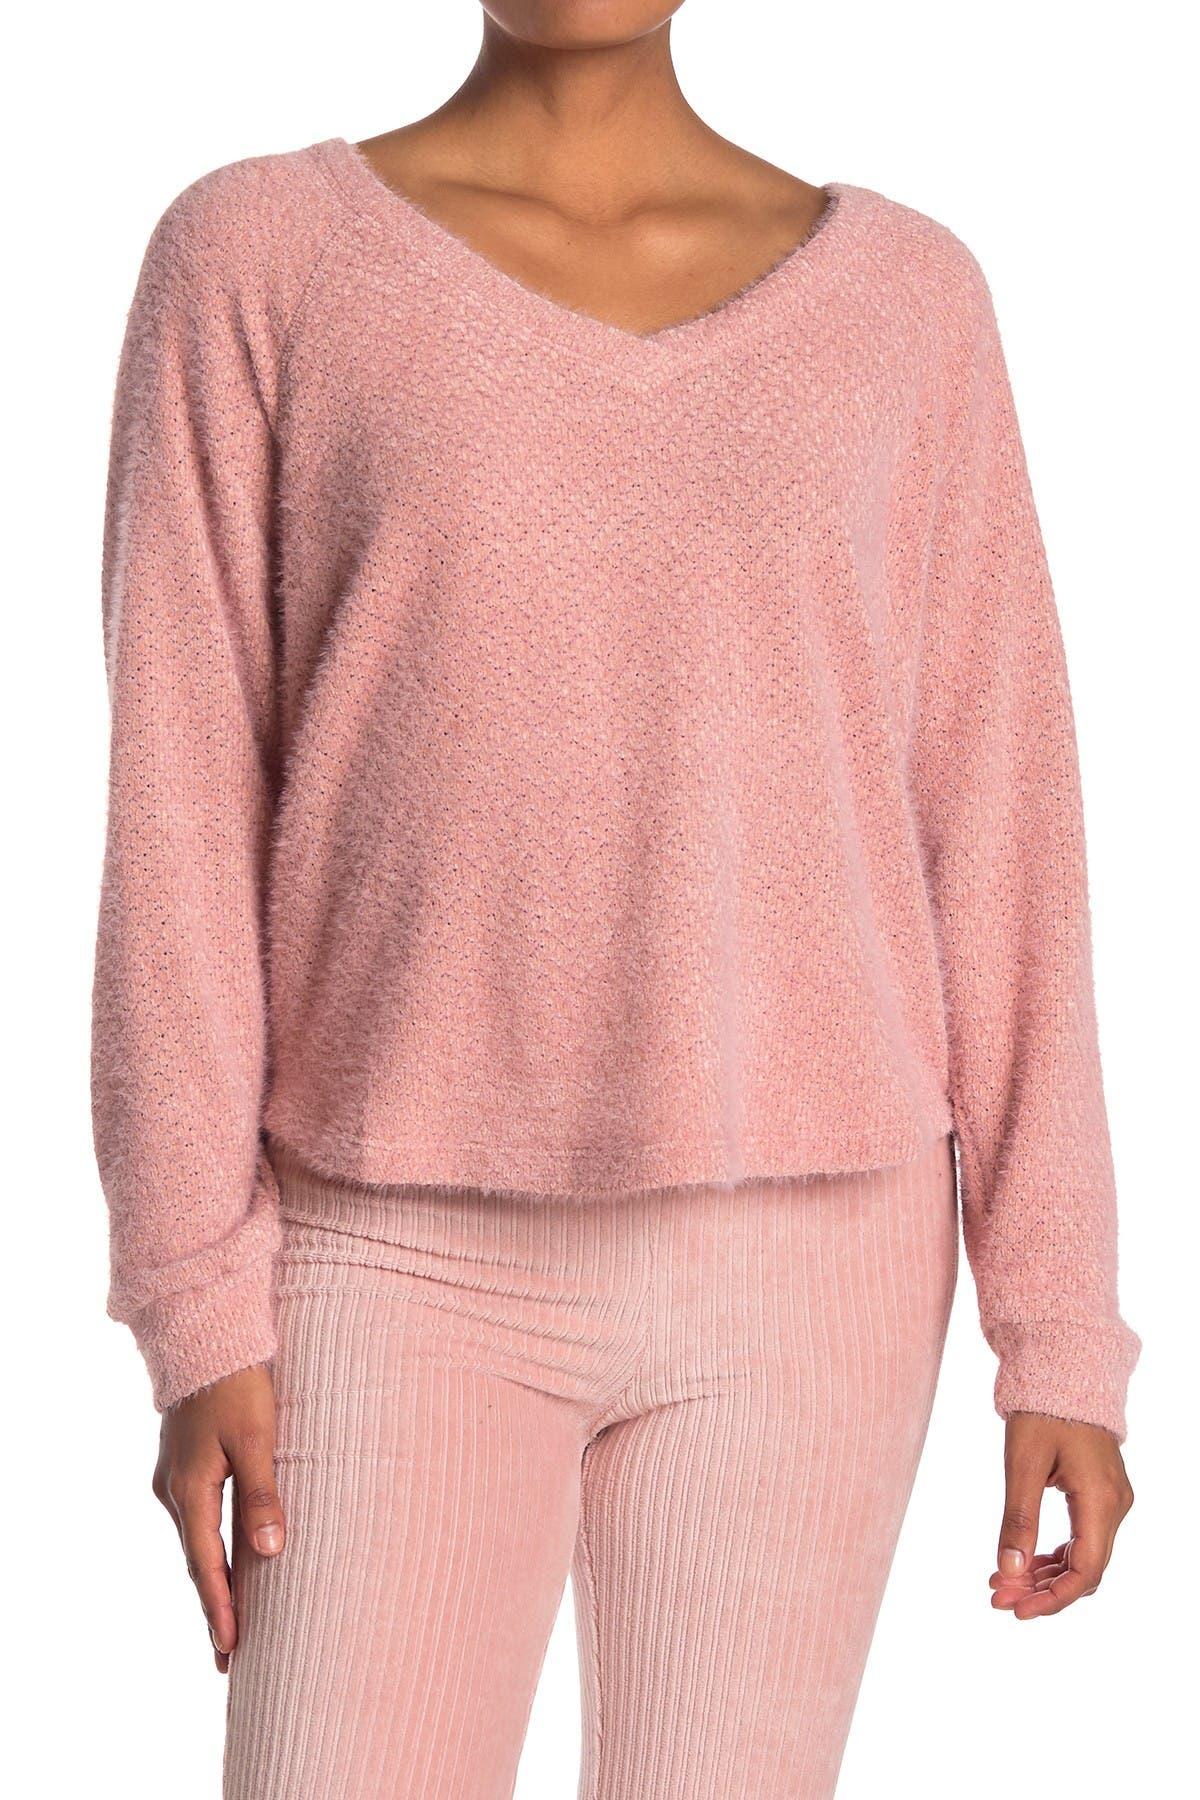 Image of Double Zero V-Neck Textured Sweater